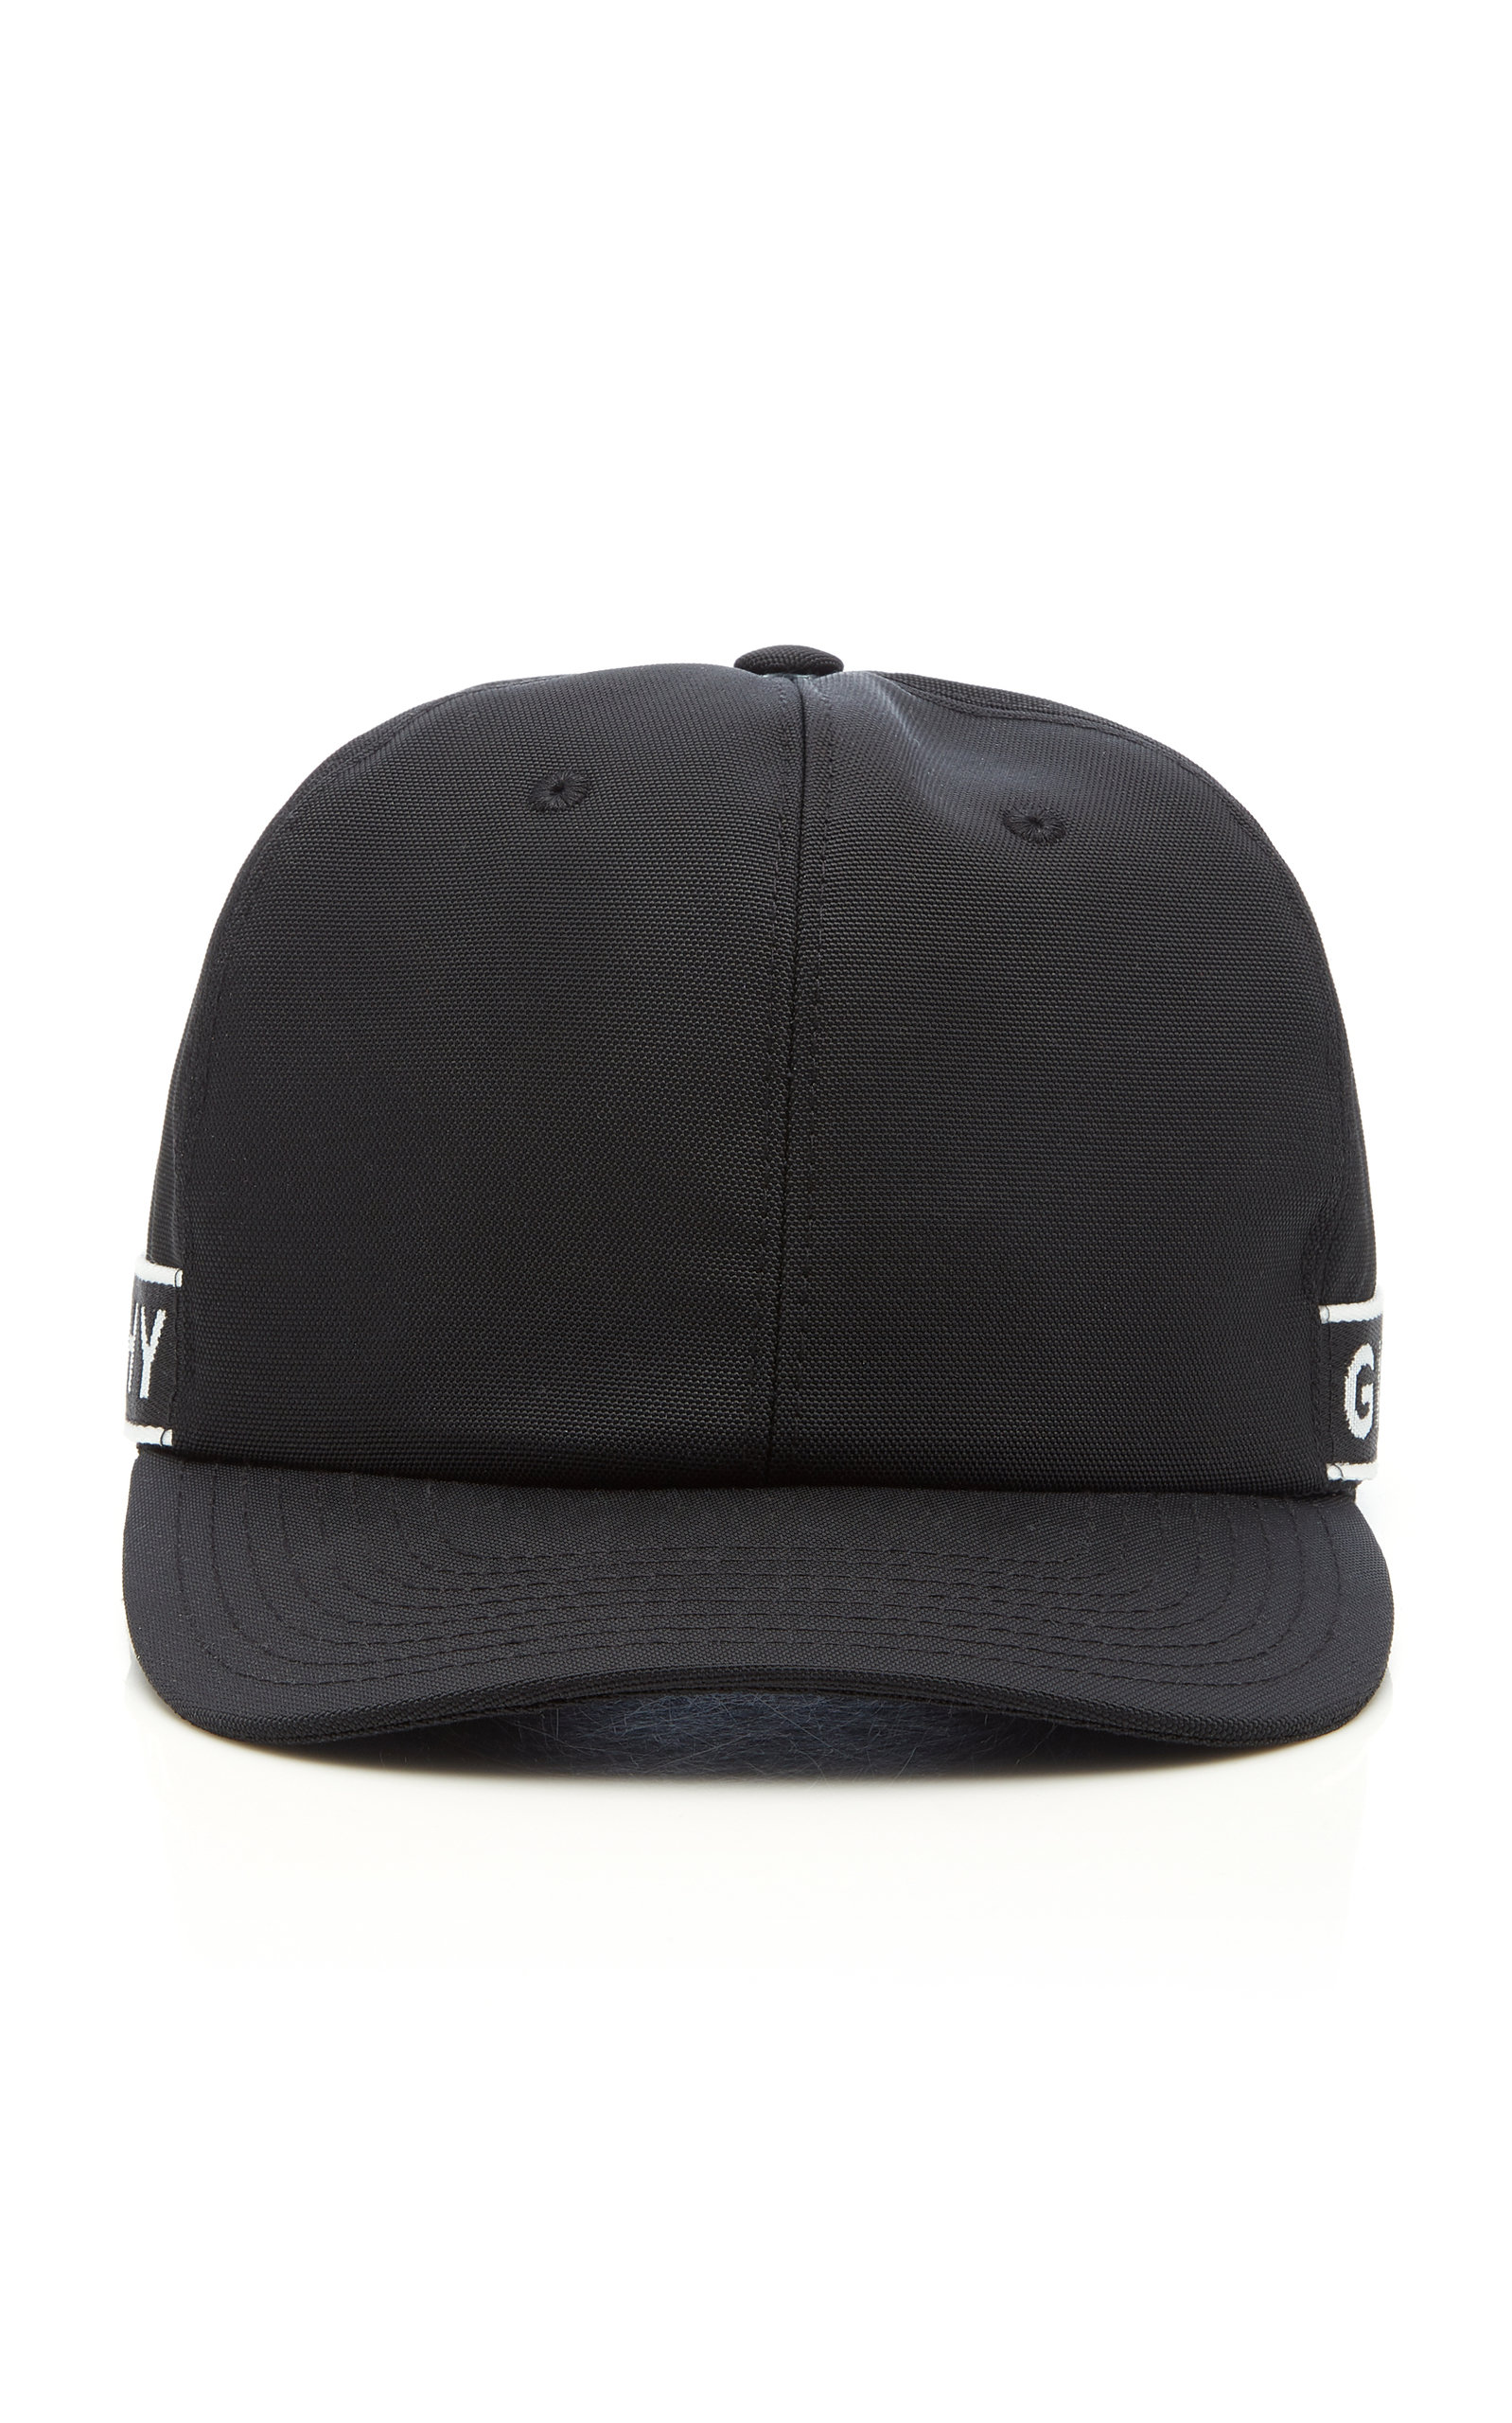 0973f15c2cc GivenchyLogo-Trimmed Baseball Cap. CLOSE. Loading